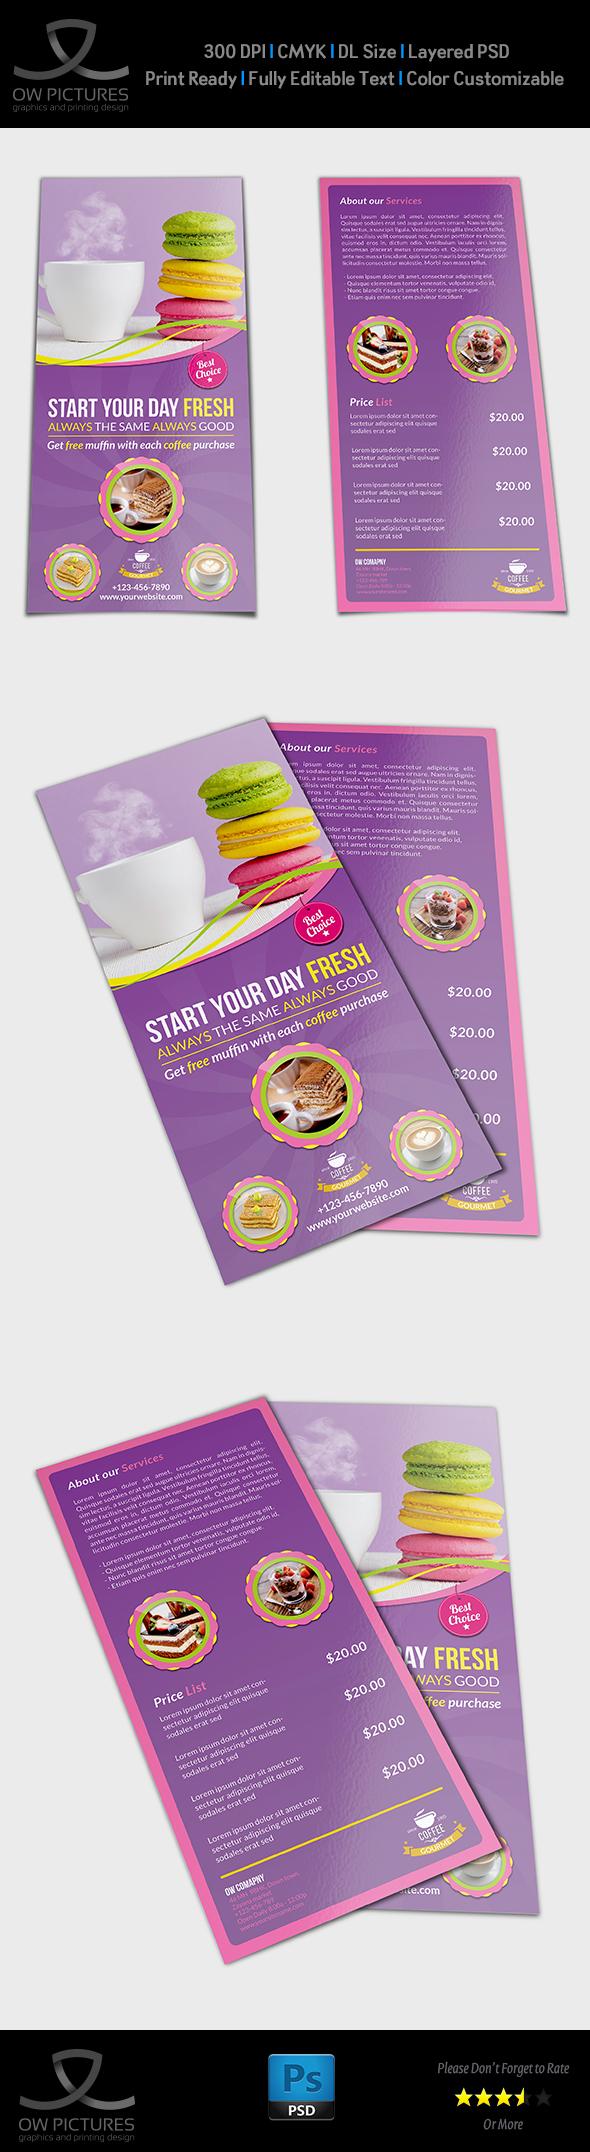 Cafe Flyer DL Size Template On Behance - Dl size flyer template